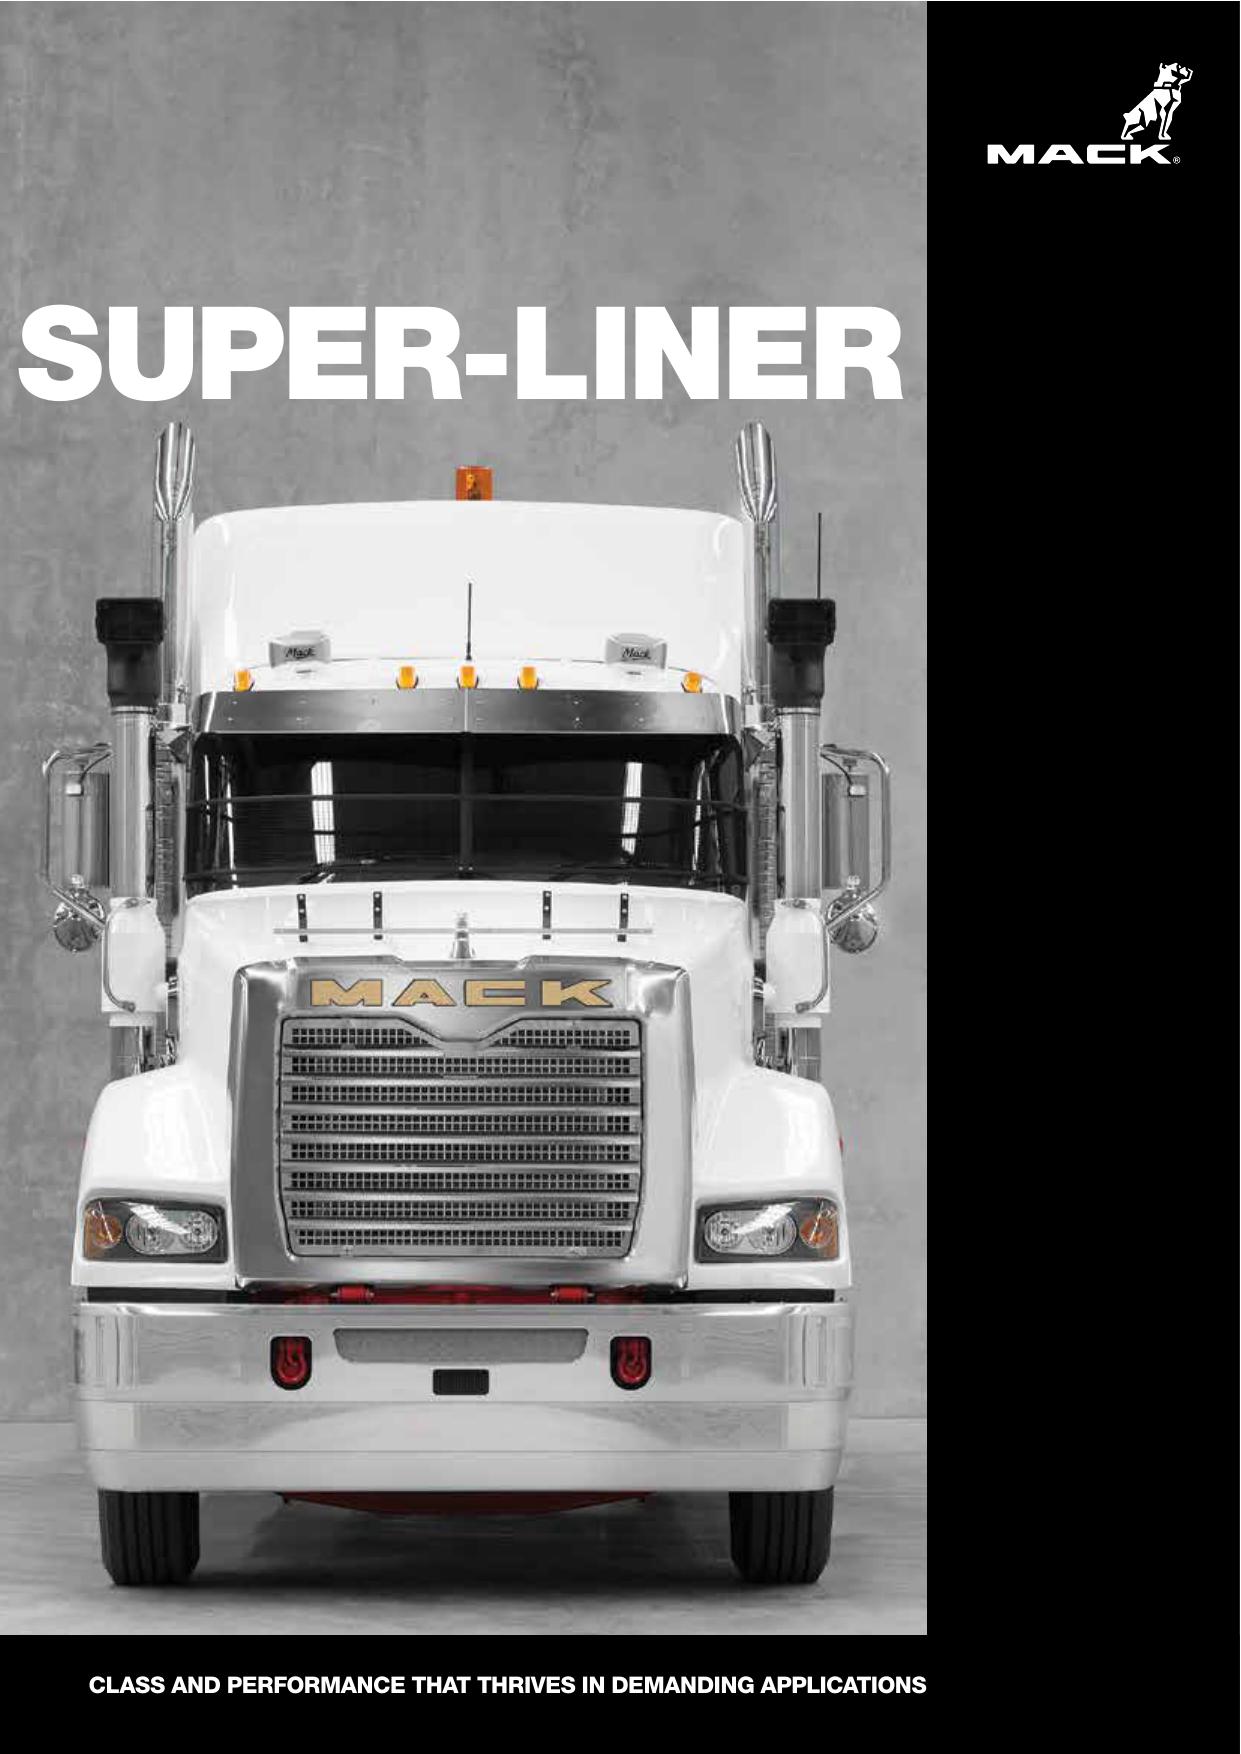 super-liner - Mack Trucks Australia   manualzz.com on